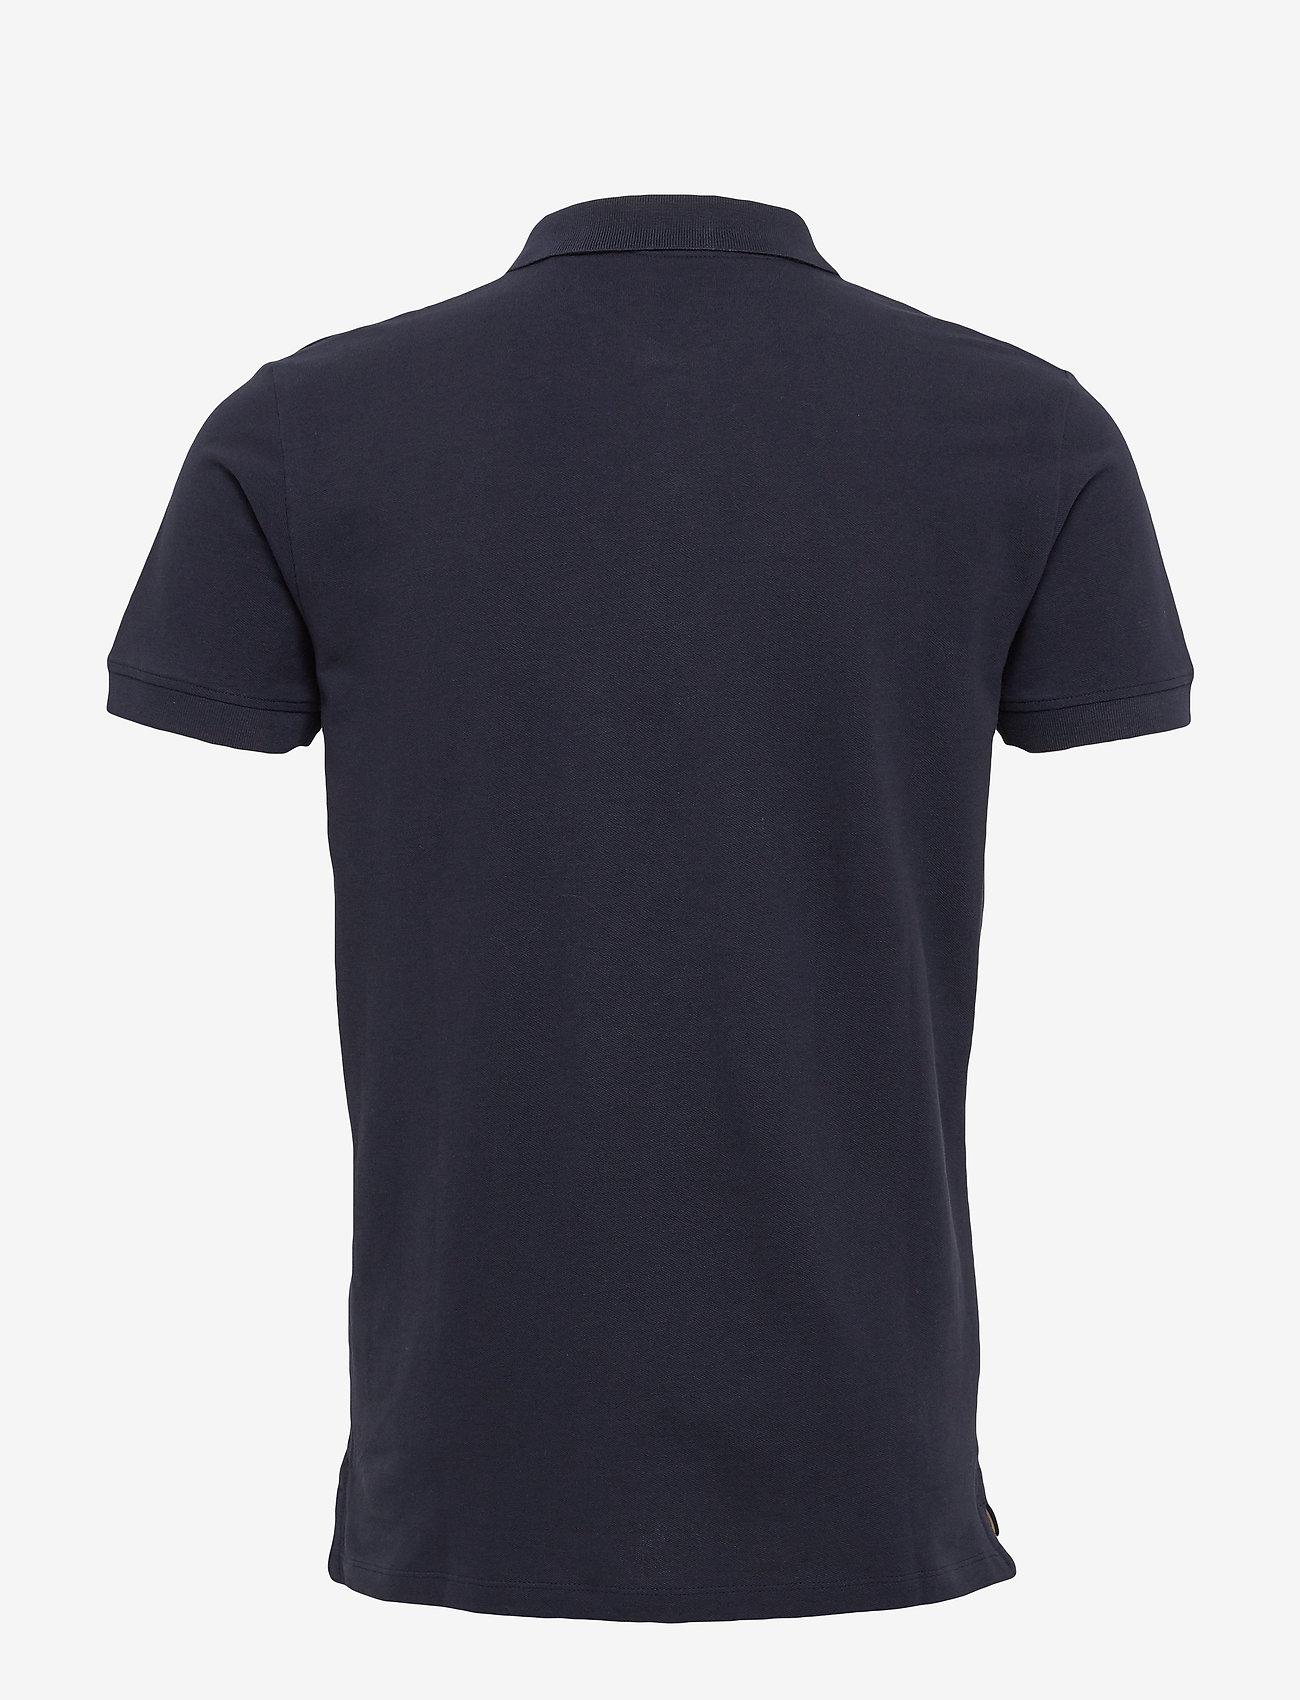 Esprit Casual Polo shirts - Poloskjorter NAVY - Menn Klær